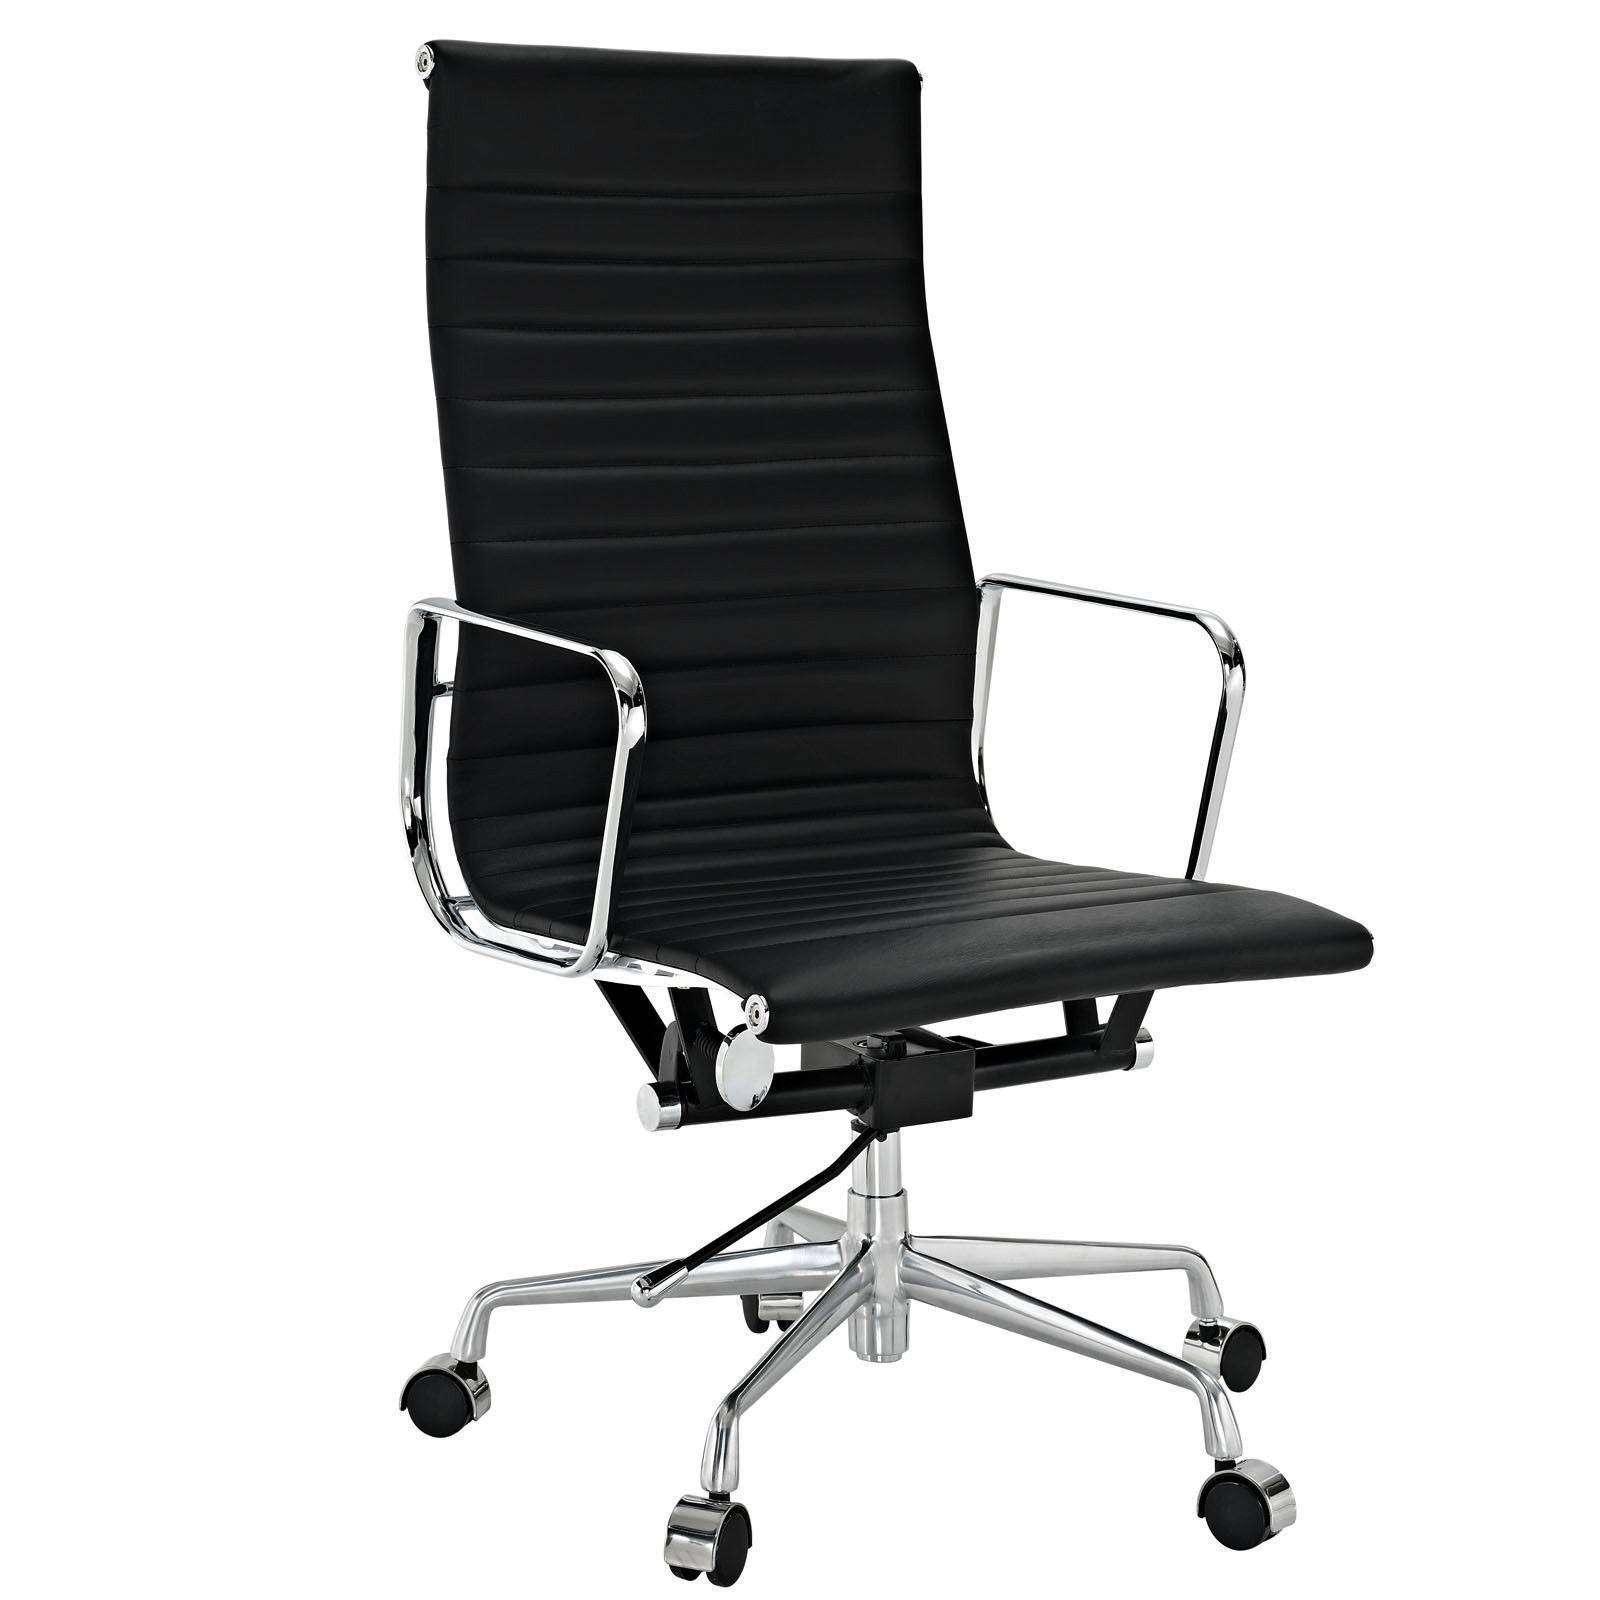 Eames Executive Chair Classic Aluminum Office Chair